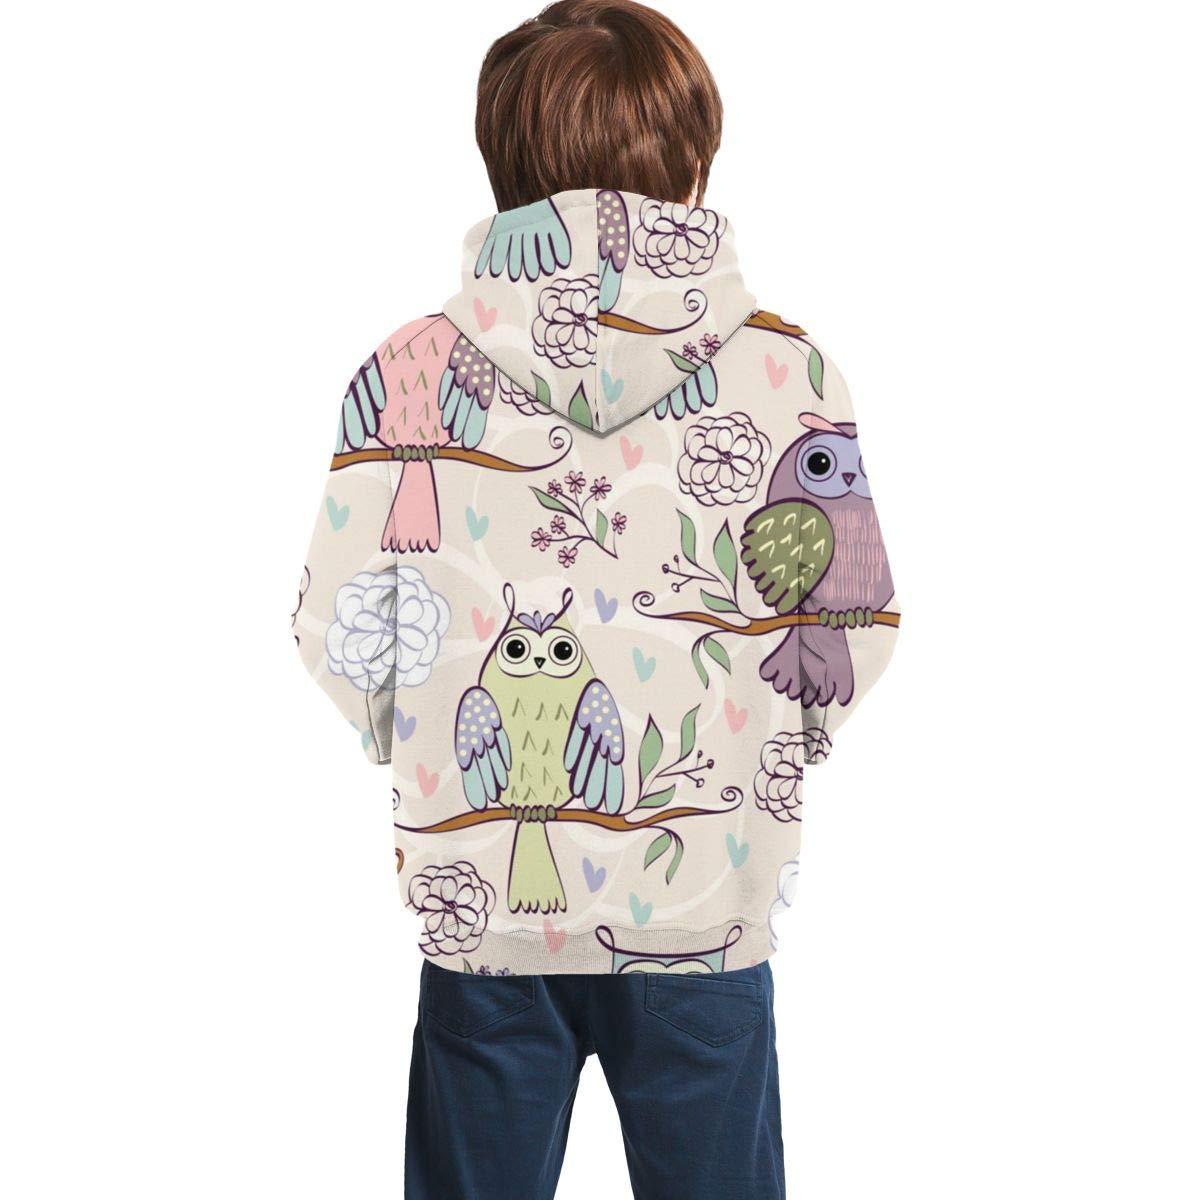 Youth 3D Print Owl On A Branch Hooded Sweatshirt Kids